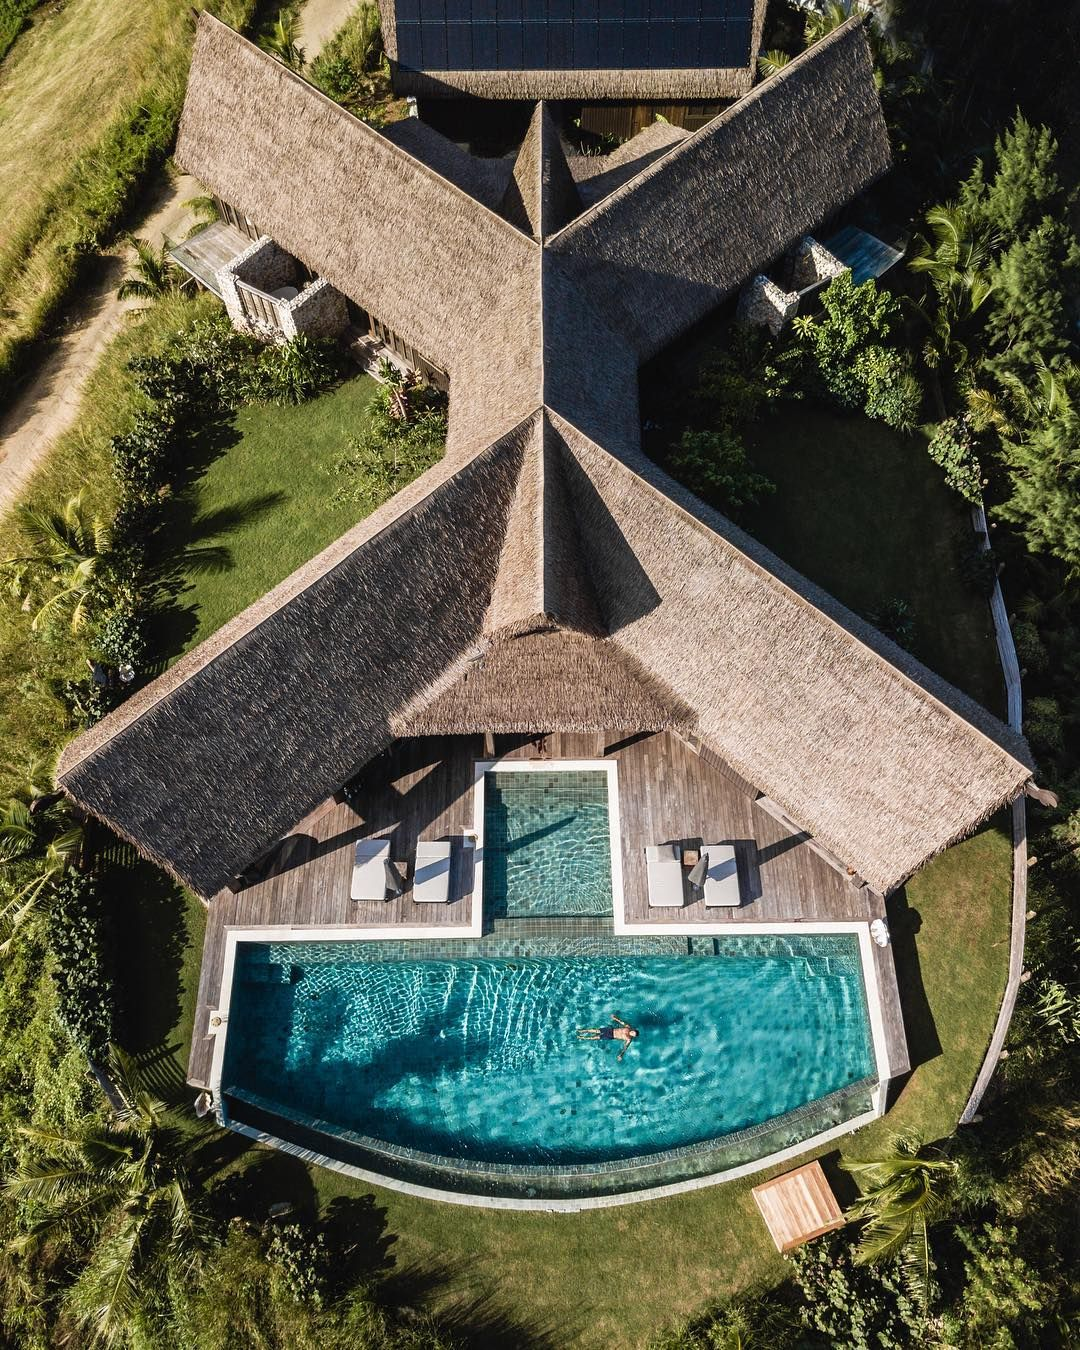 93 Likes 3 Comments Getaway With Kids Getawaywithkids On Instagram Spoilt And Loving It Sixsensesfiji Si Resort Luxury Spa Resort Luxury Resort